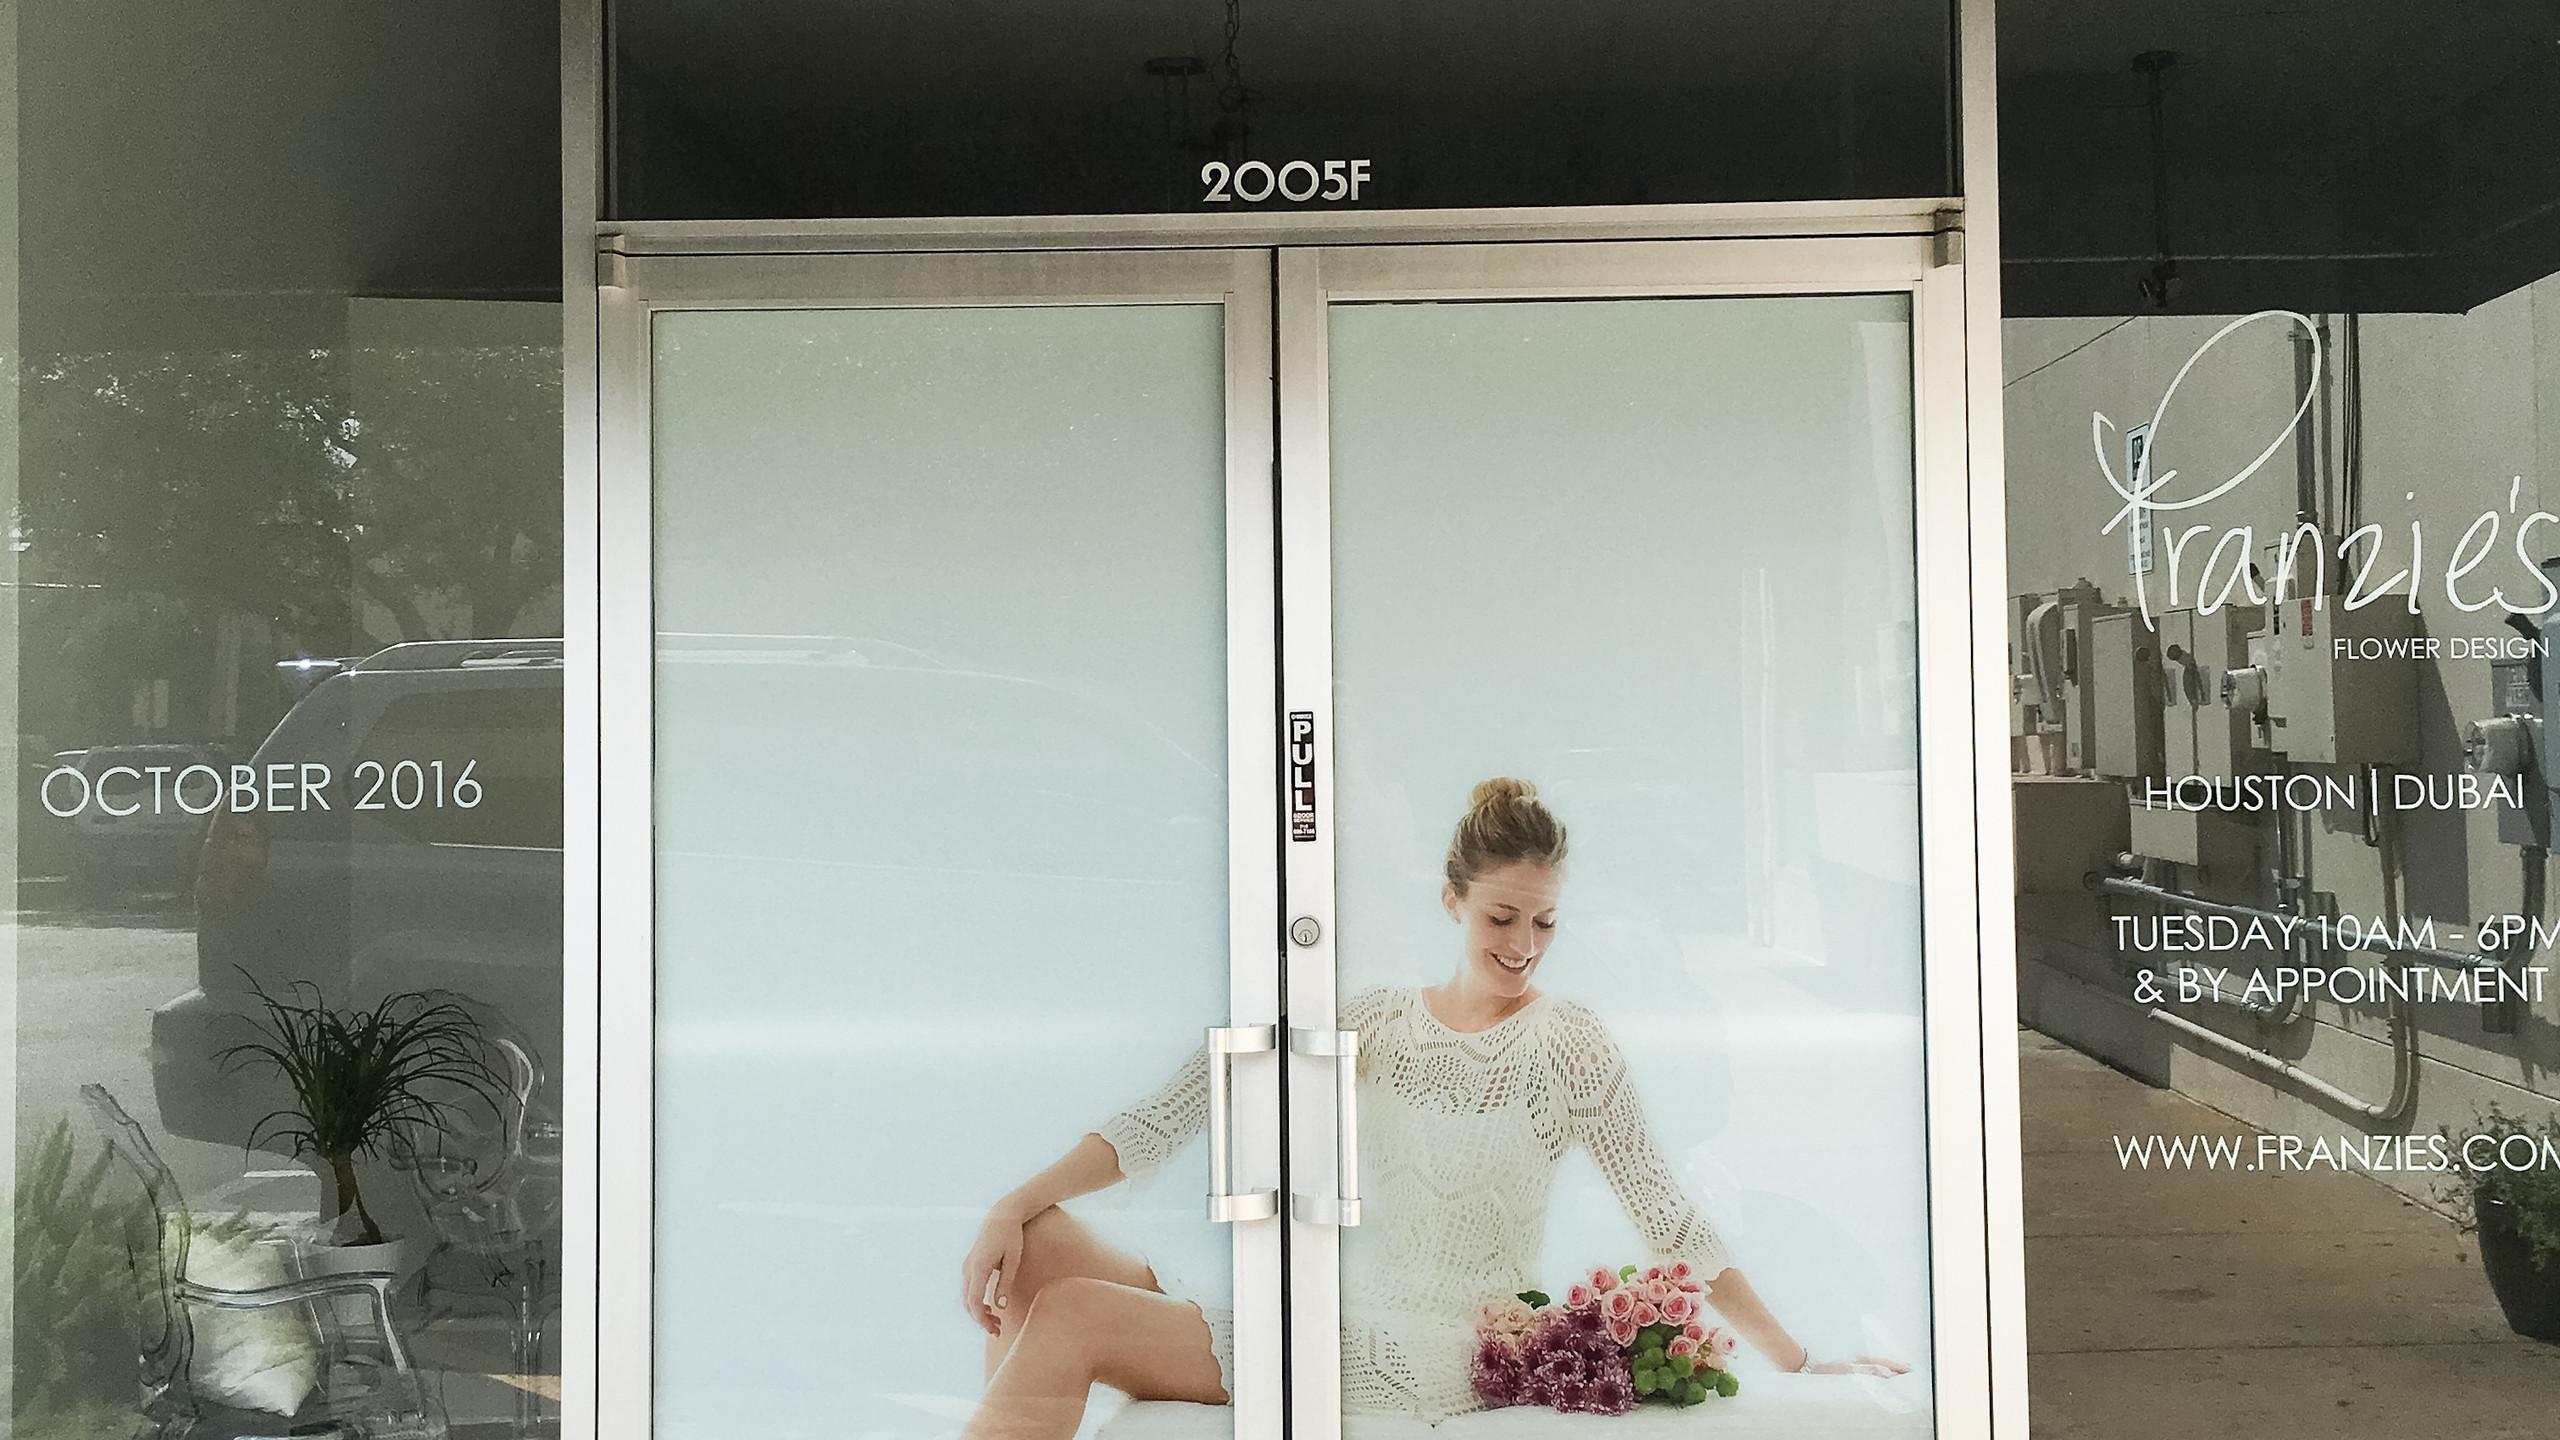 Franzie's Flower Design Storefront in the River Oaks Shopping Center located in Houston, TX.